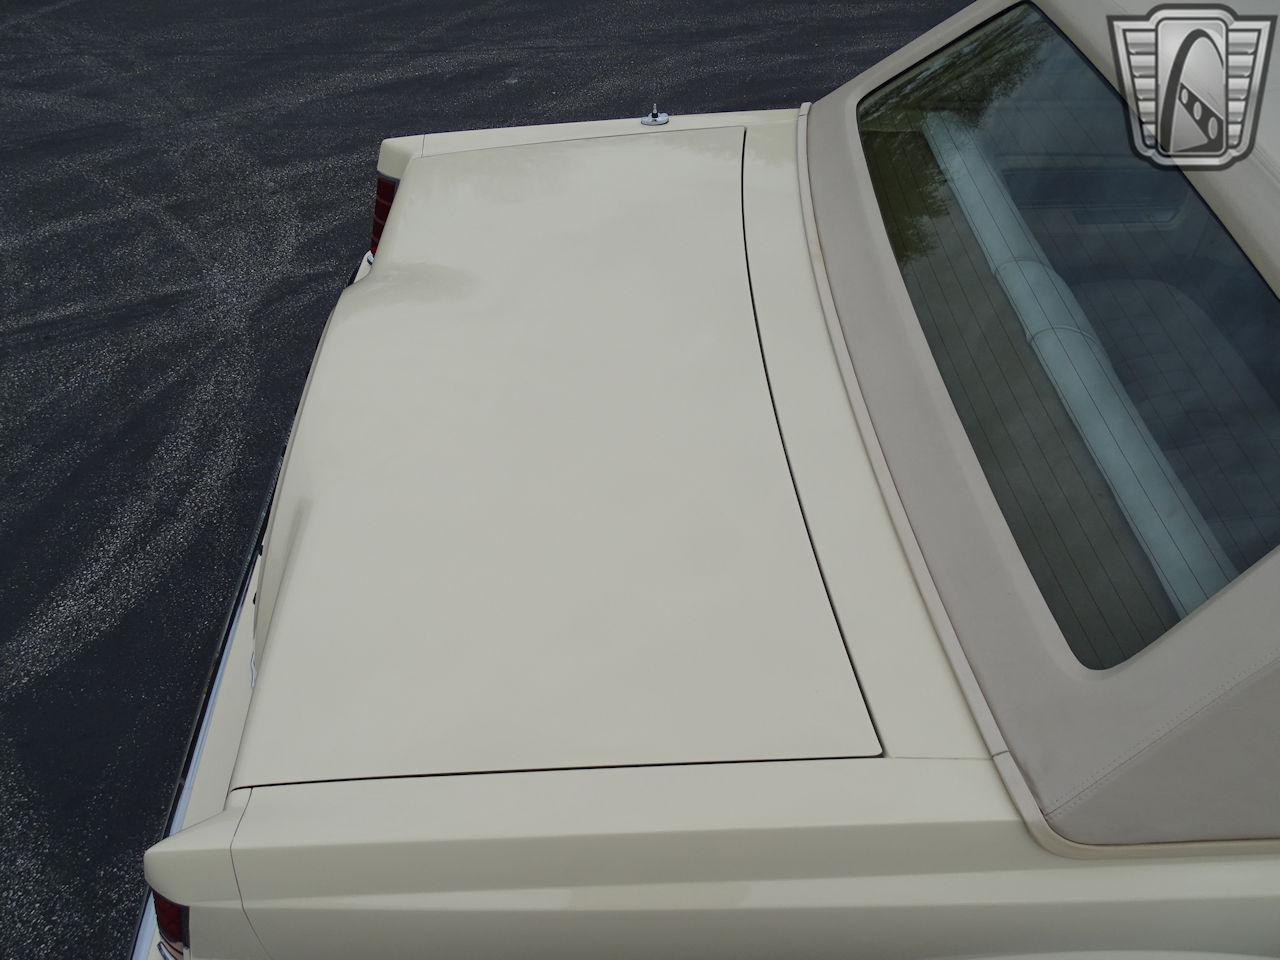 1983 Lincoln Continental 4